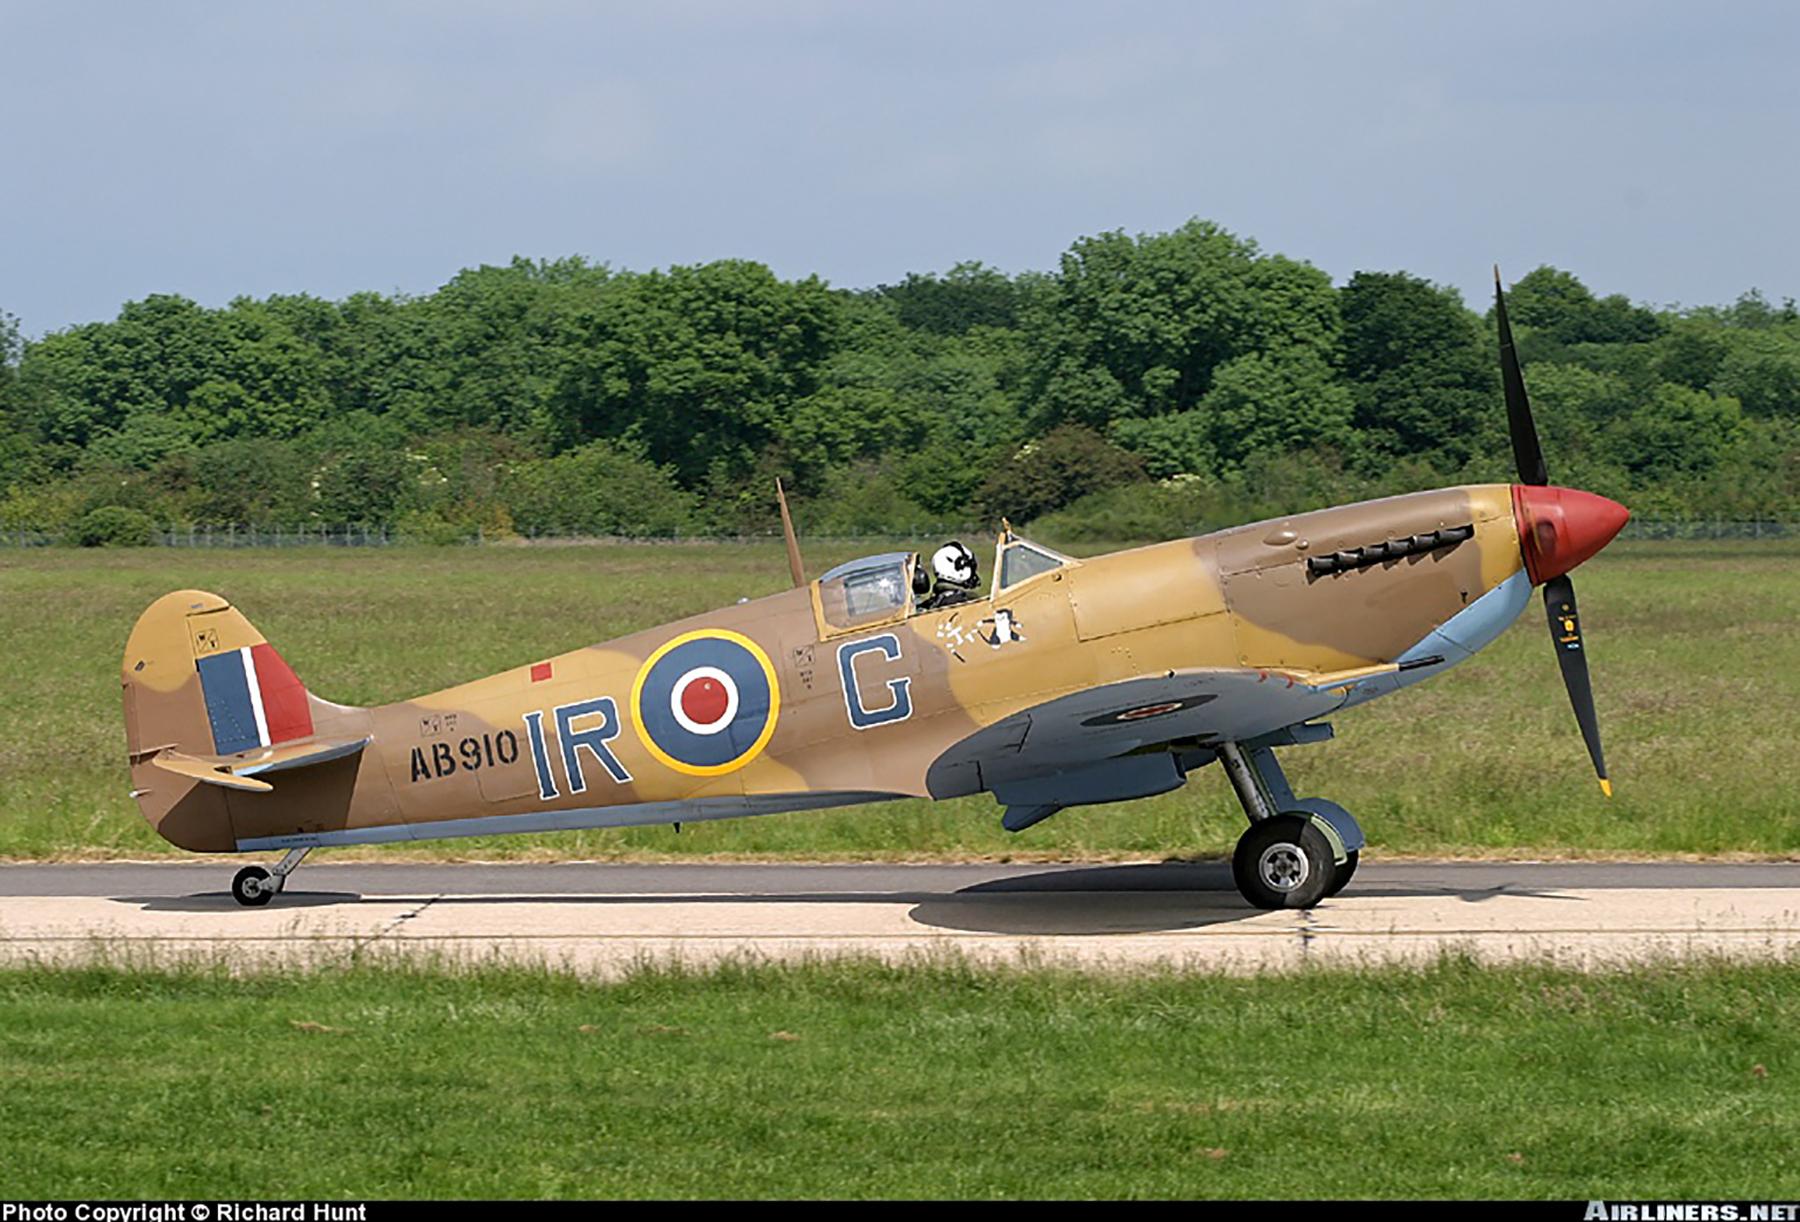 Airworthy Spitfire warbird RCAF 416Sqn IRG AB910 05